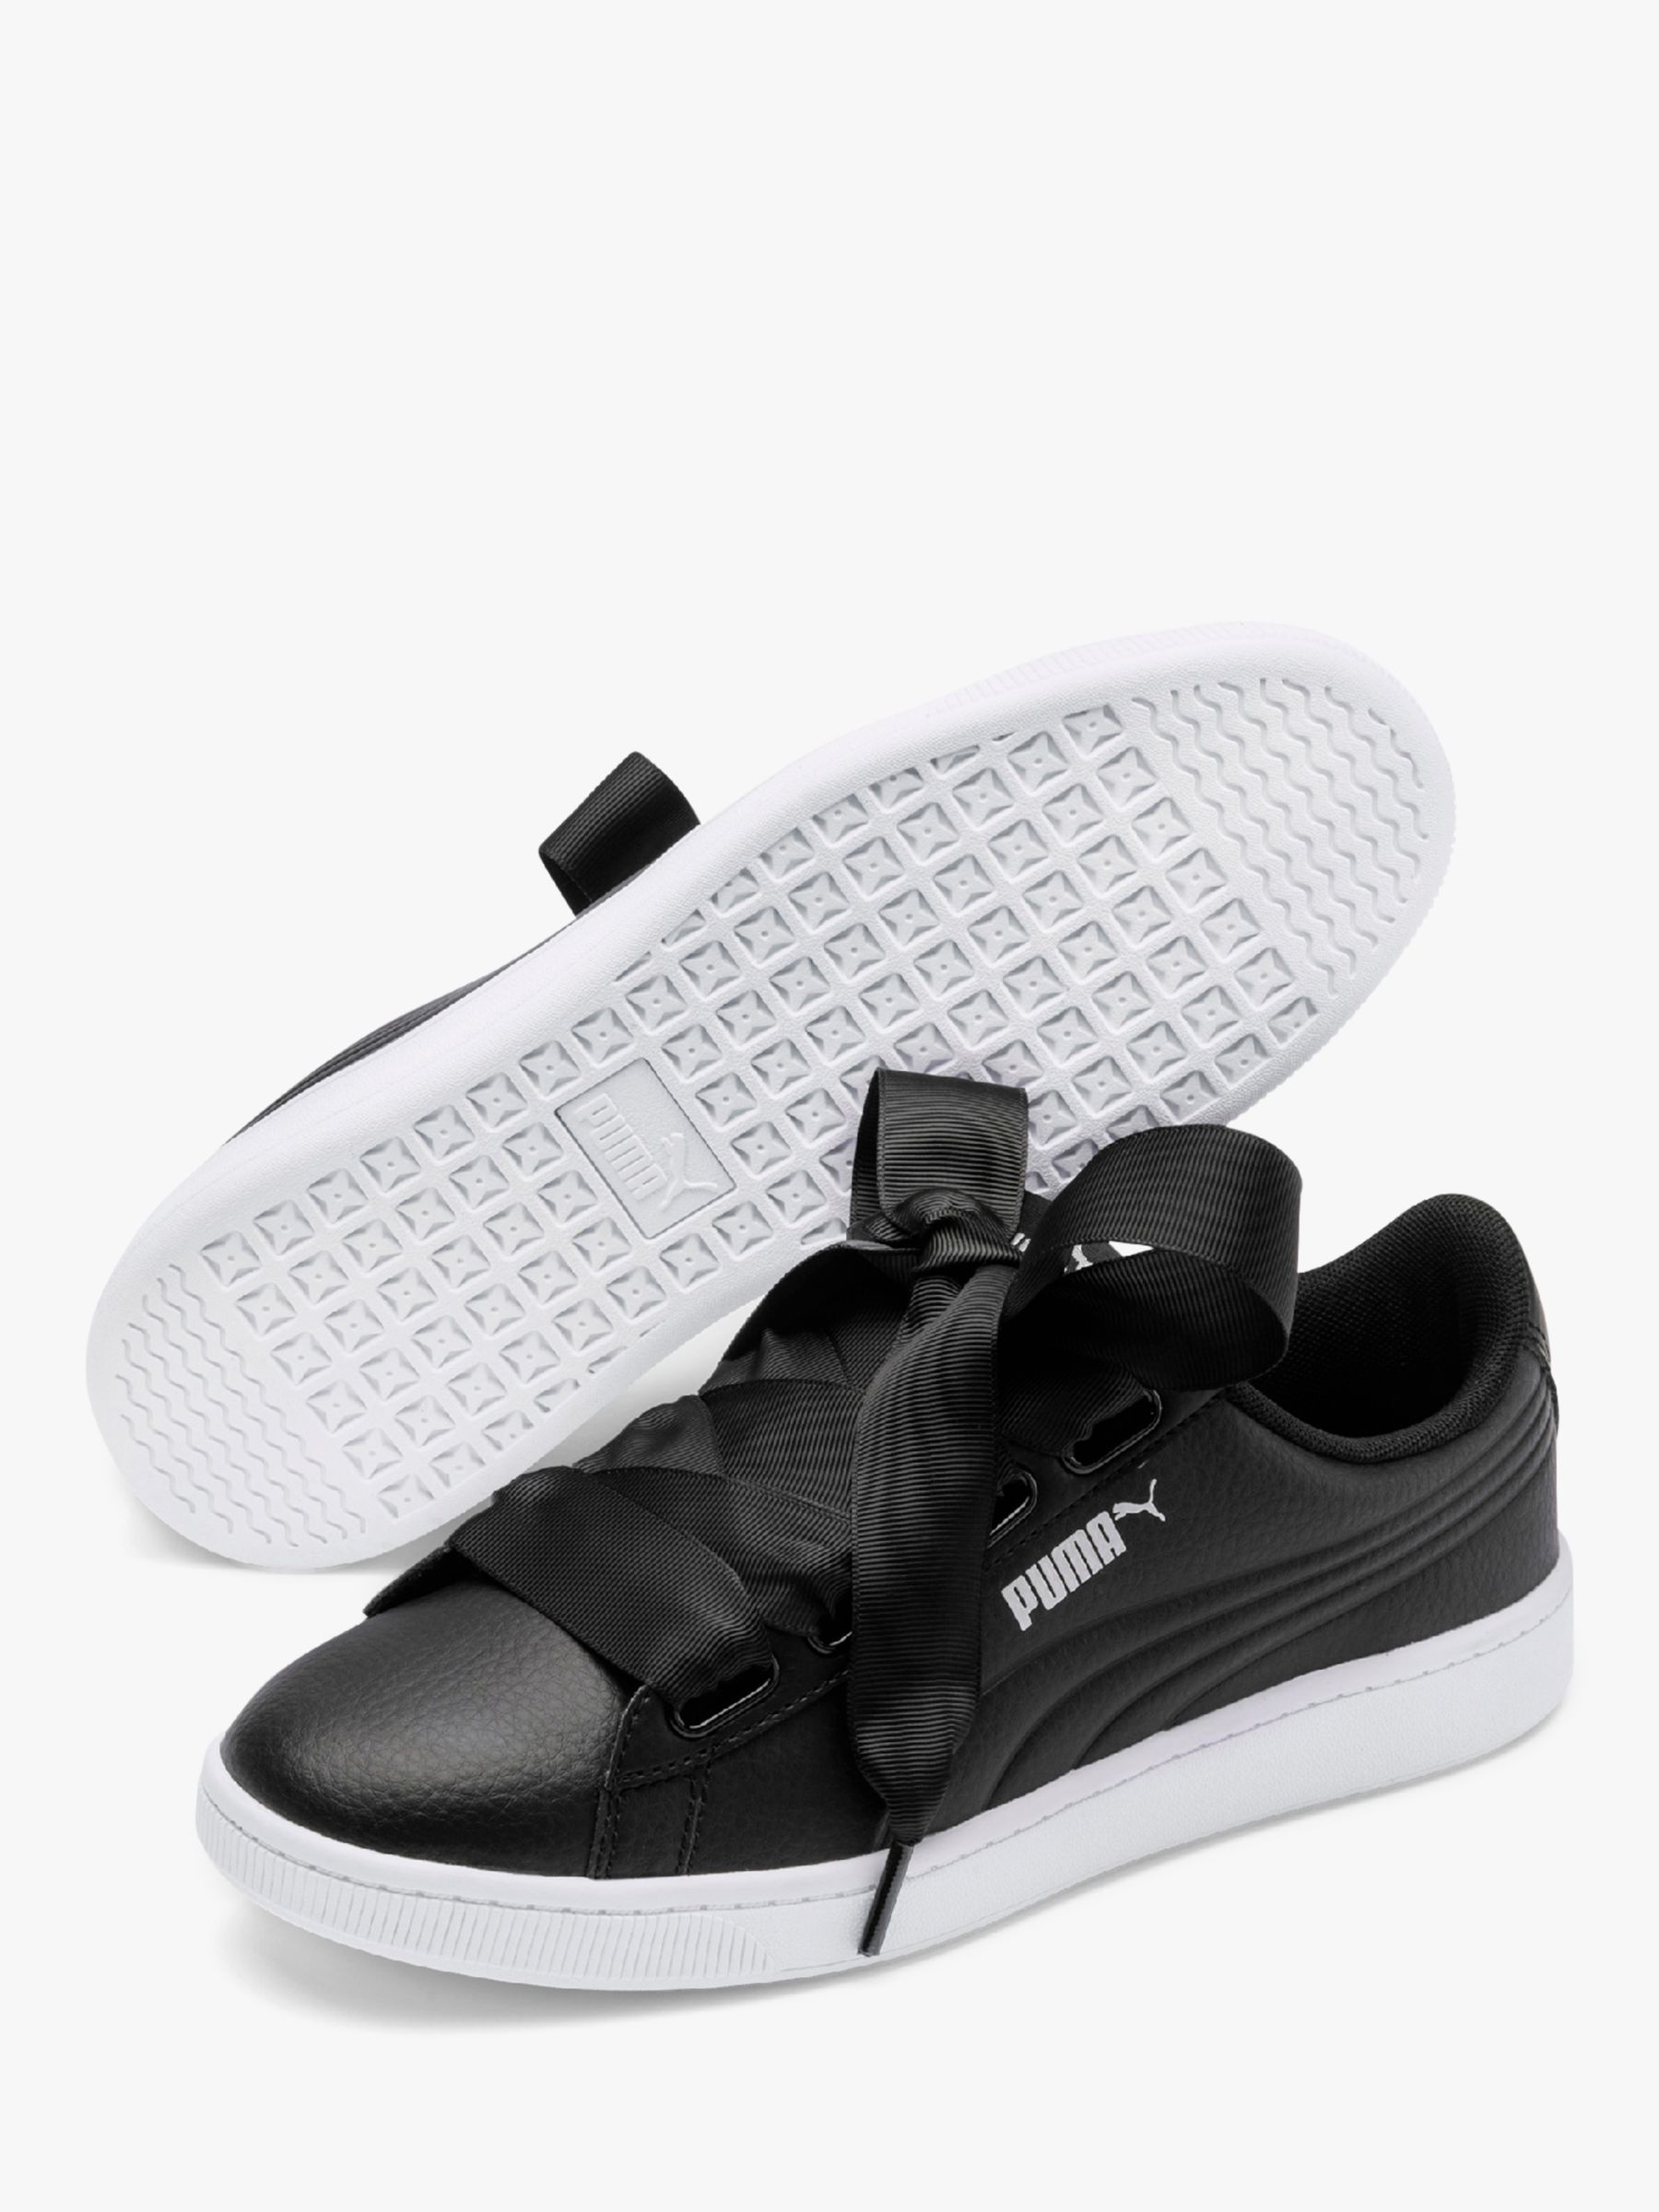 PUMA Vikky Ribbon Patent Women's Sneakers Color Puma White